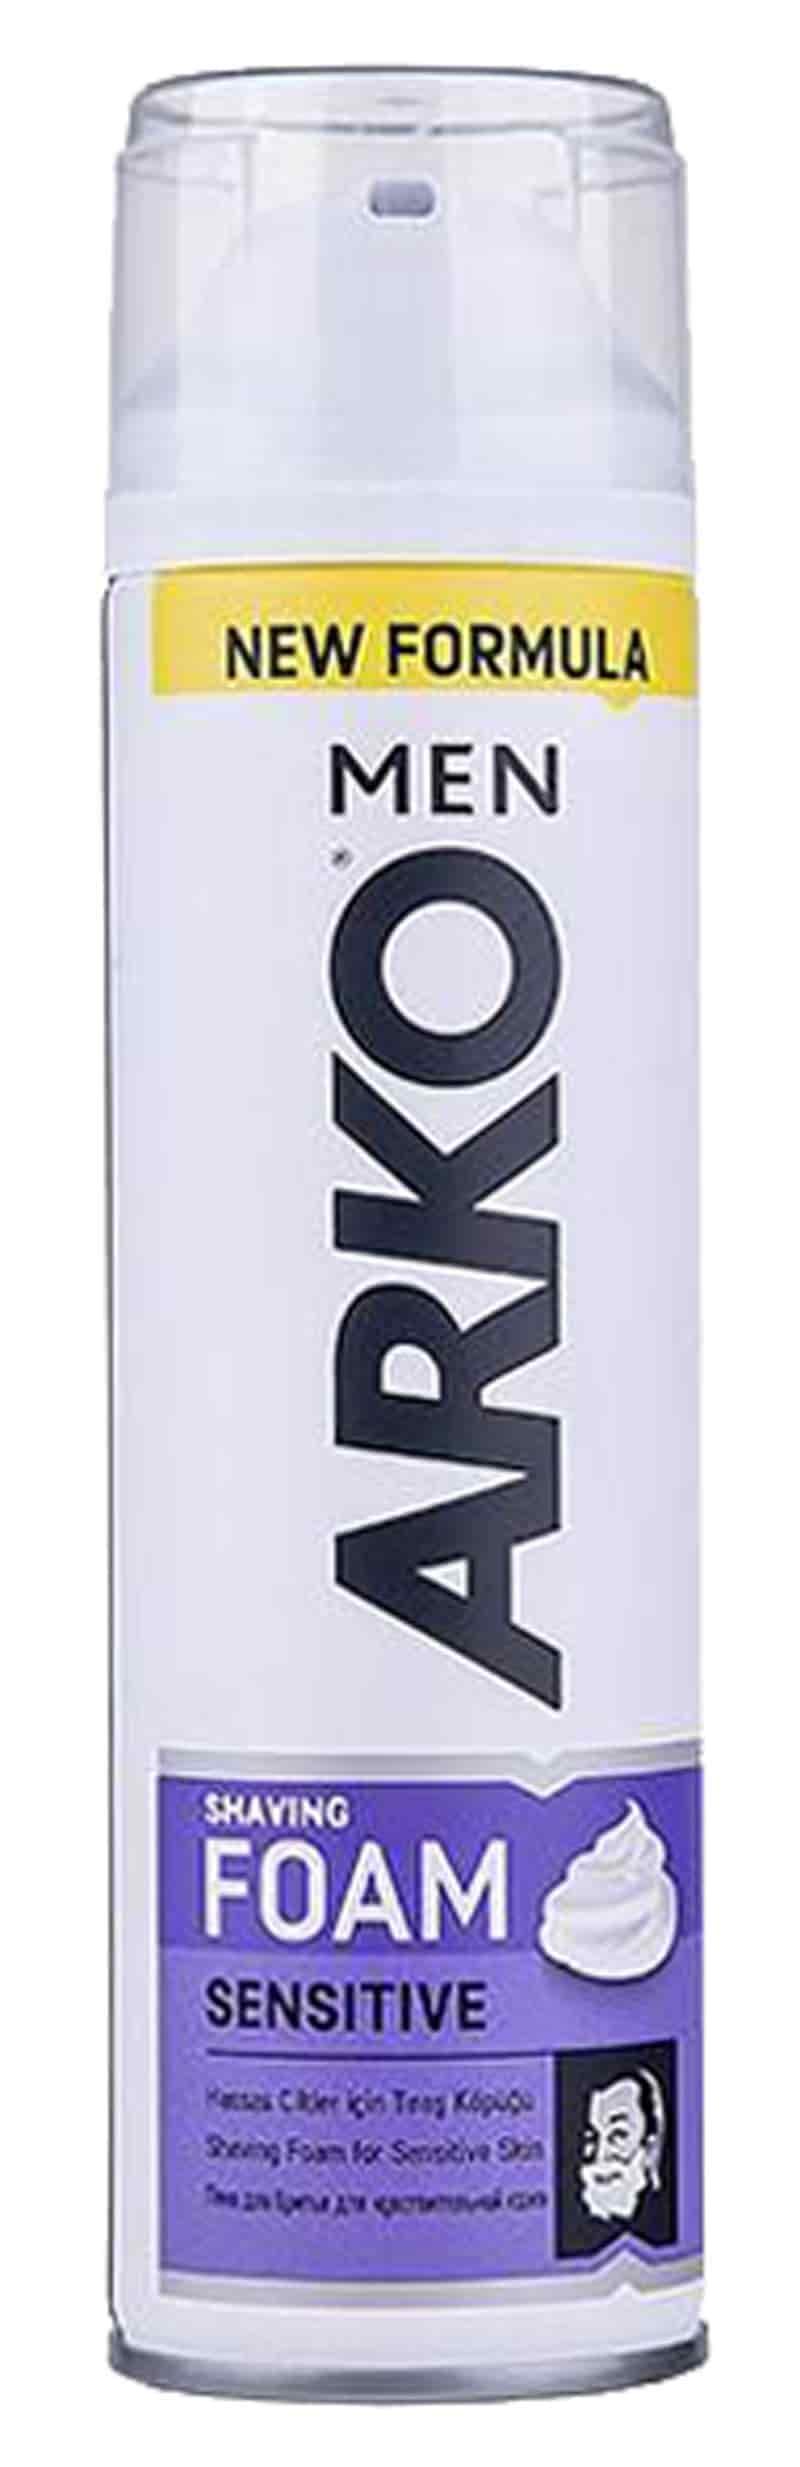 خرید کرم اصلاح آرکو 200 میلی لیتر ARKO FOAM SENSETIVE